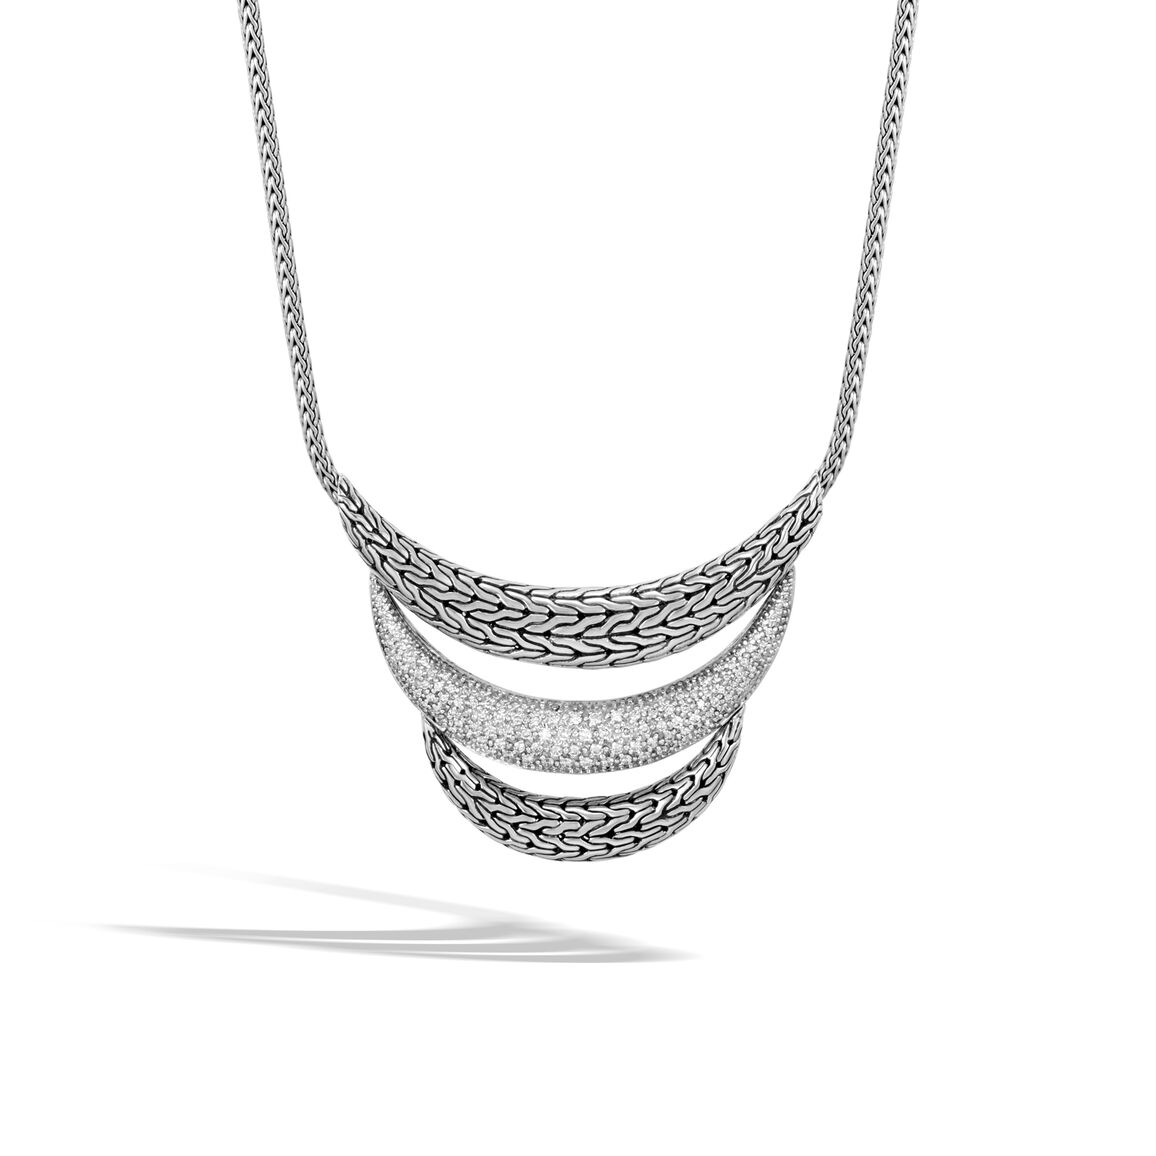 Classic Chain Bib Necklace in Silver with Diamonds